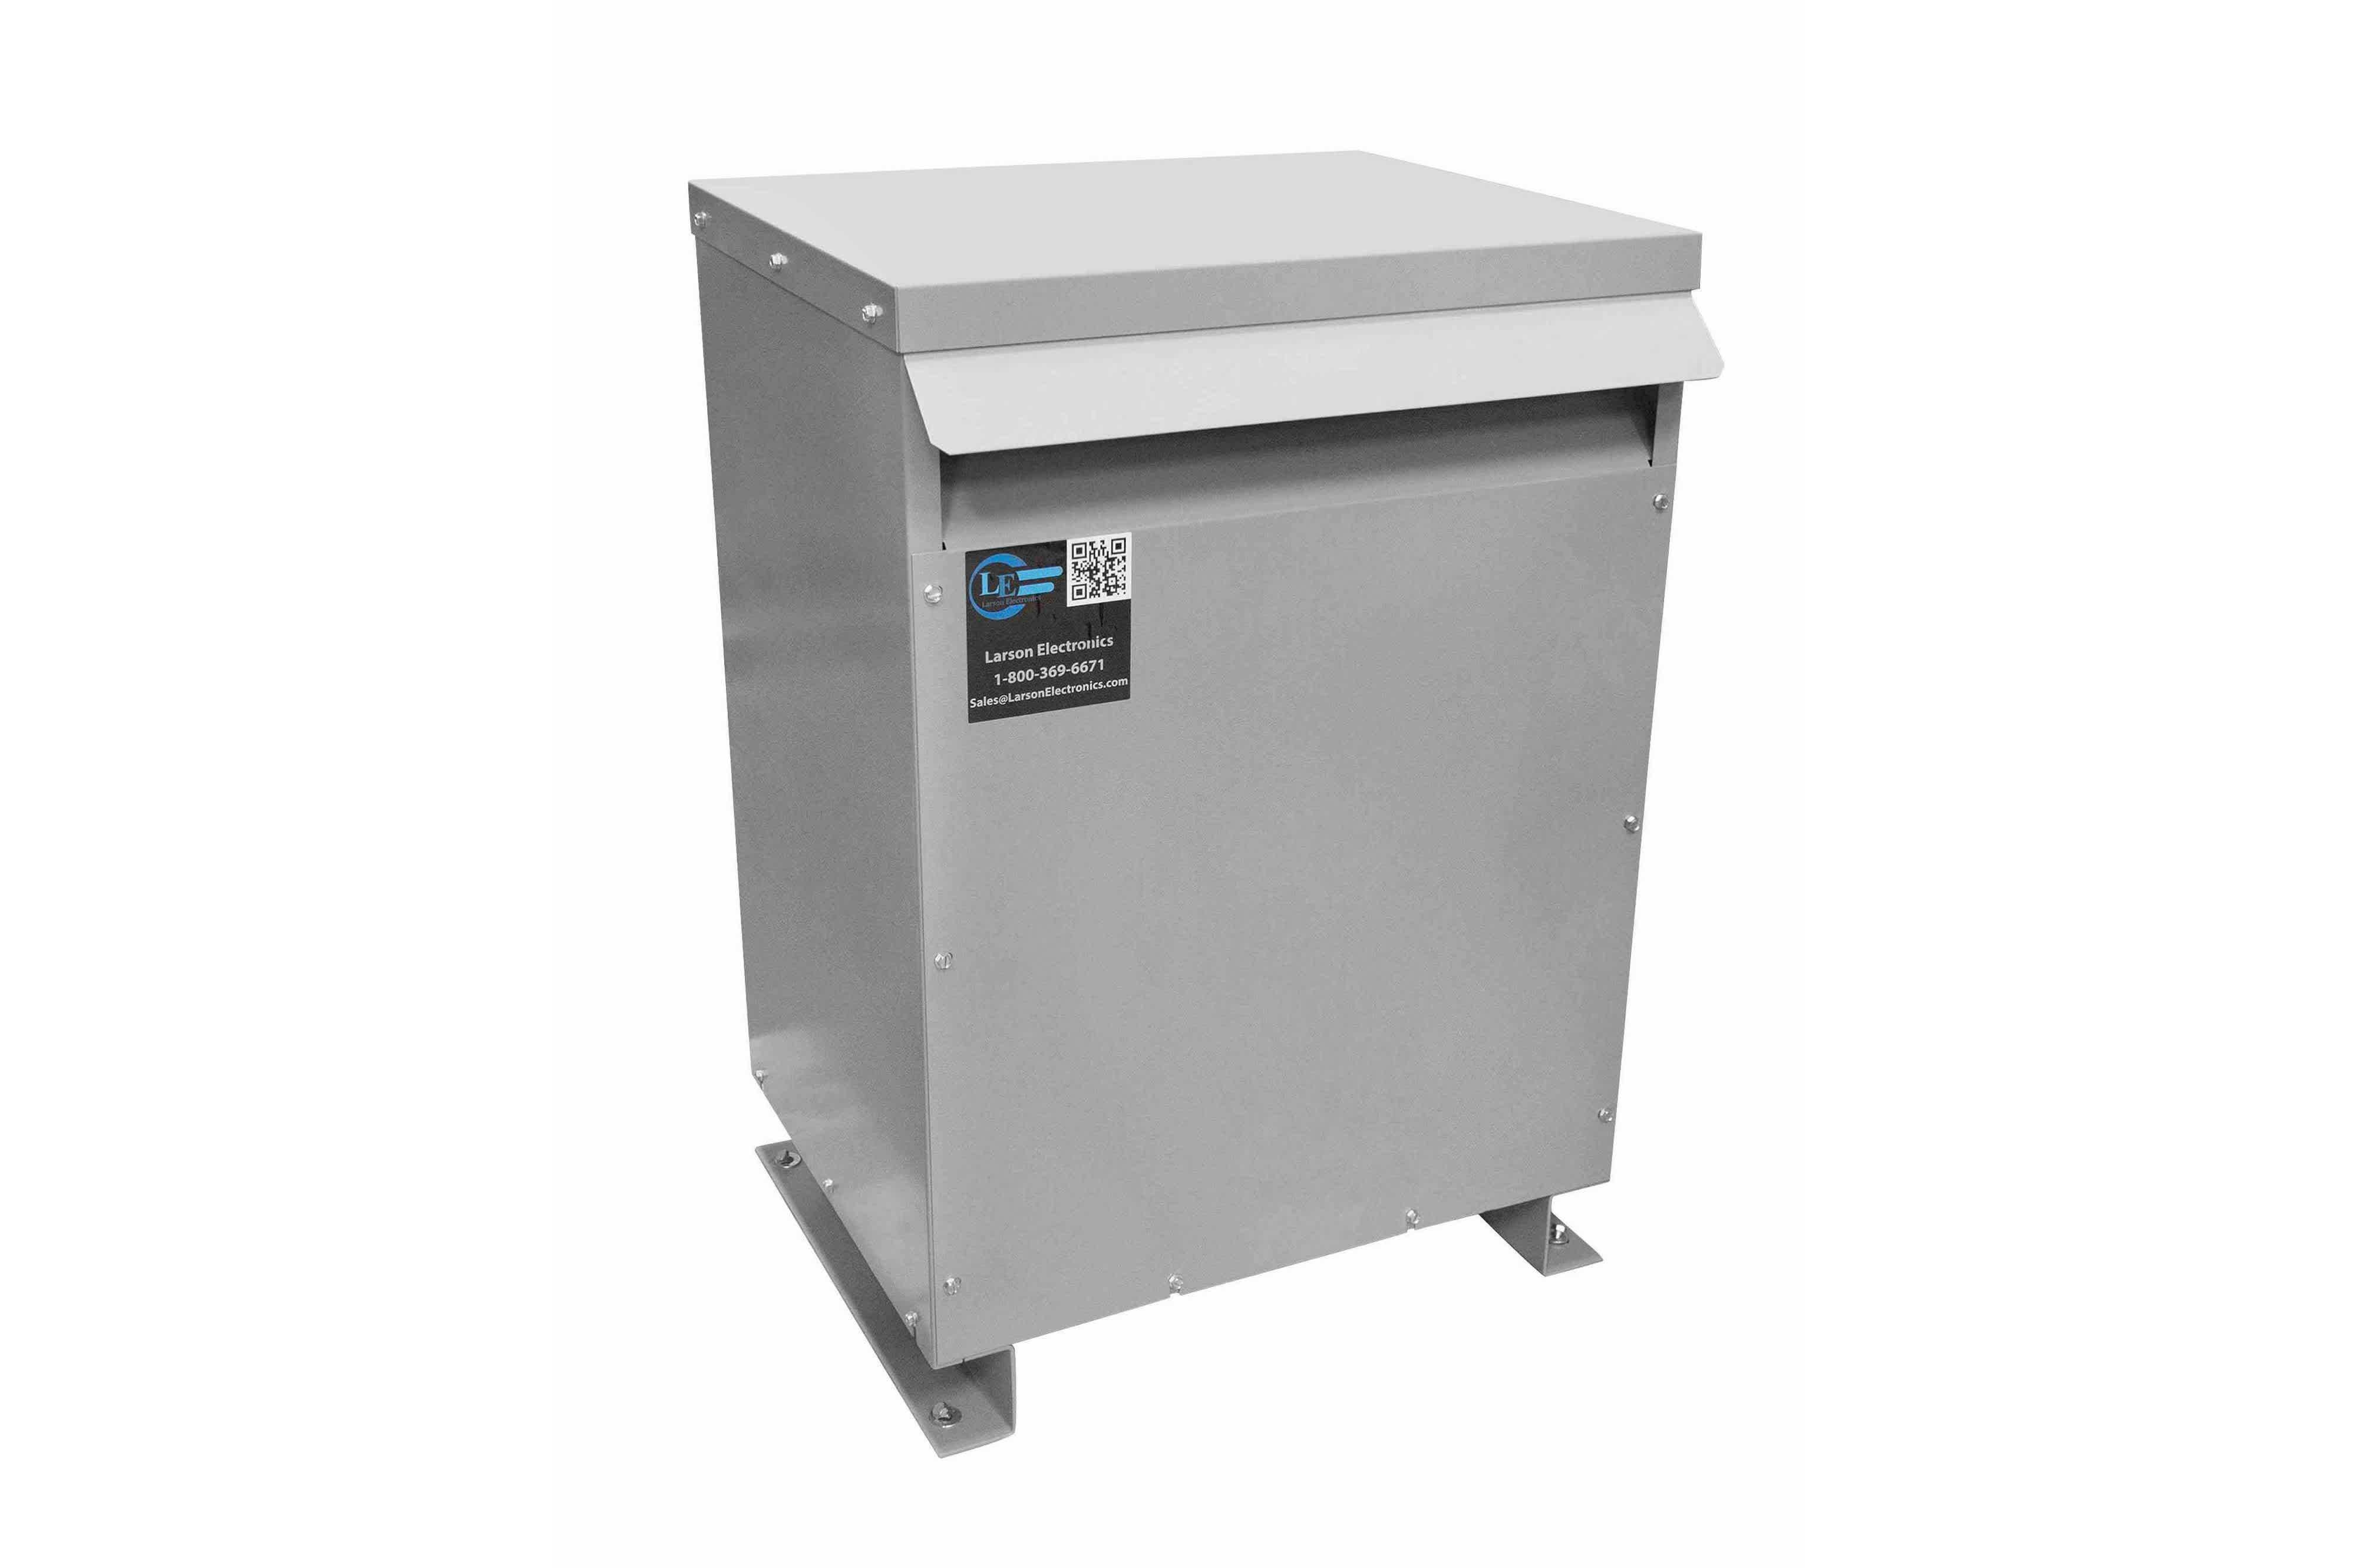 25 kVA 3PH Isolation Transformer, 240V Wye Primary, 380Y/220 Wye-N Secondary, N3R, Ventilated, 60 Hz